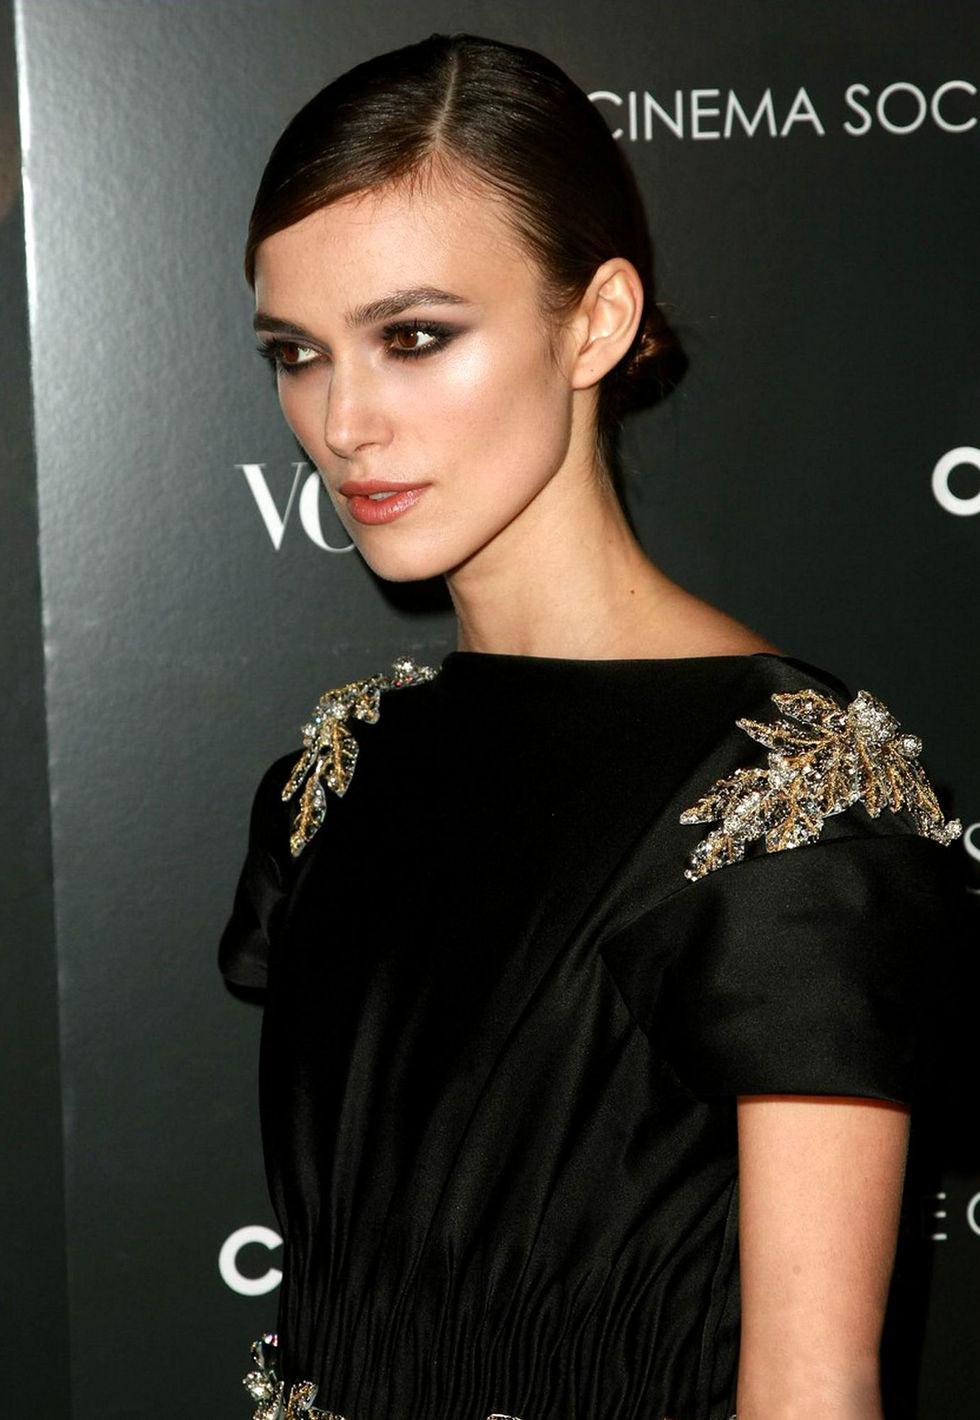 keira-knightley-the-duchess-premiere-in-new-york-01